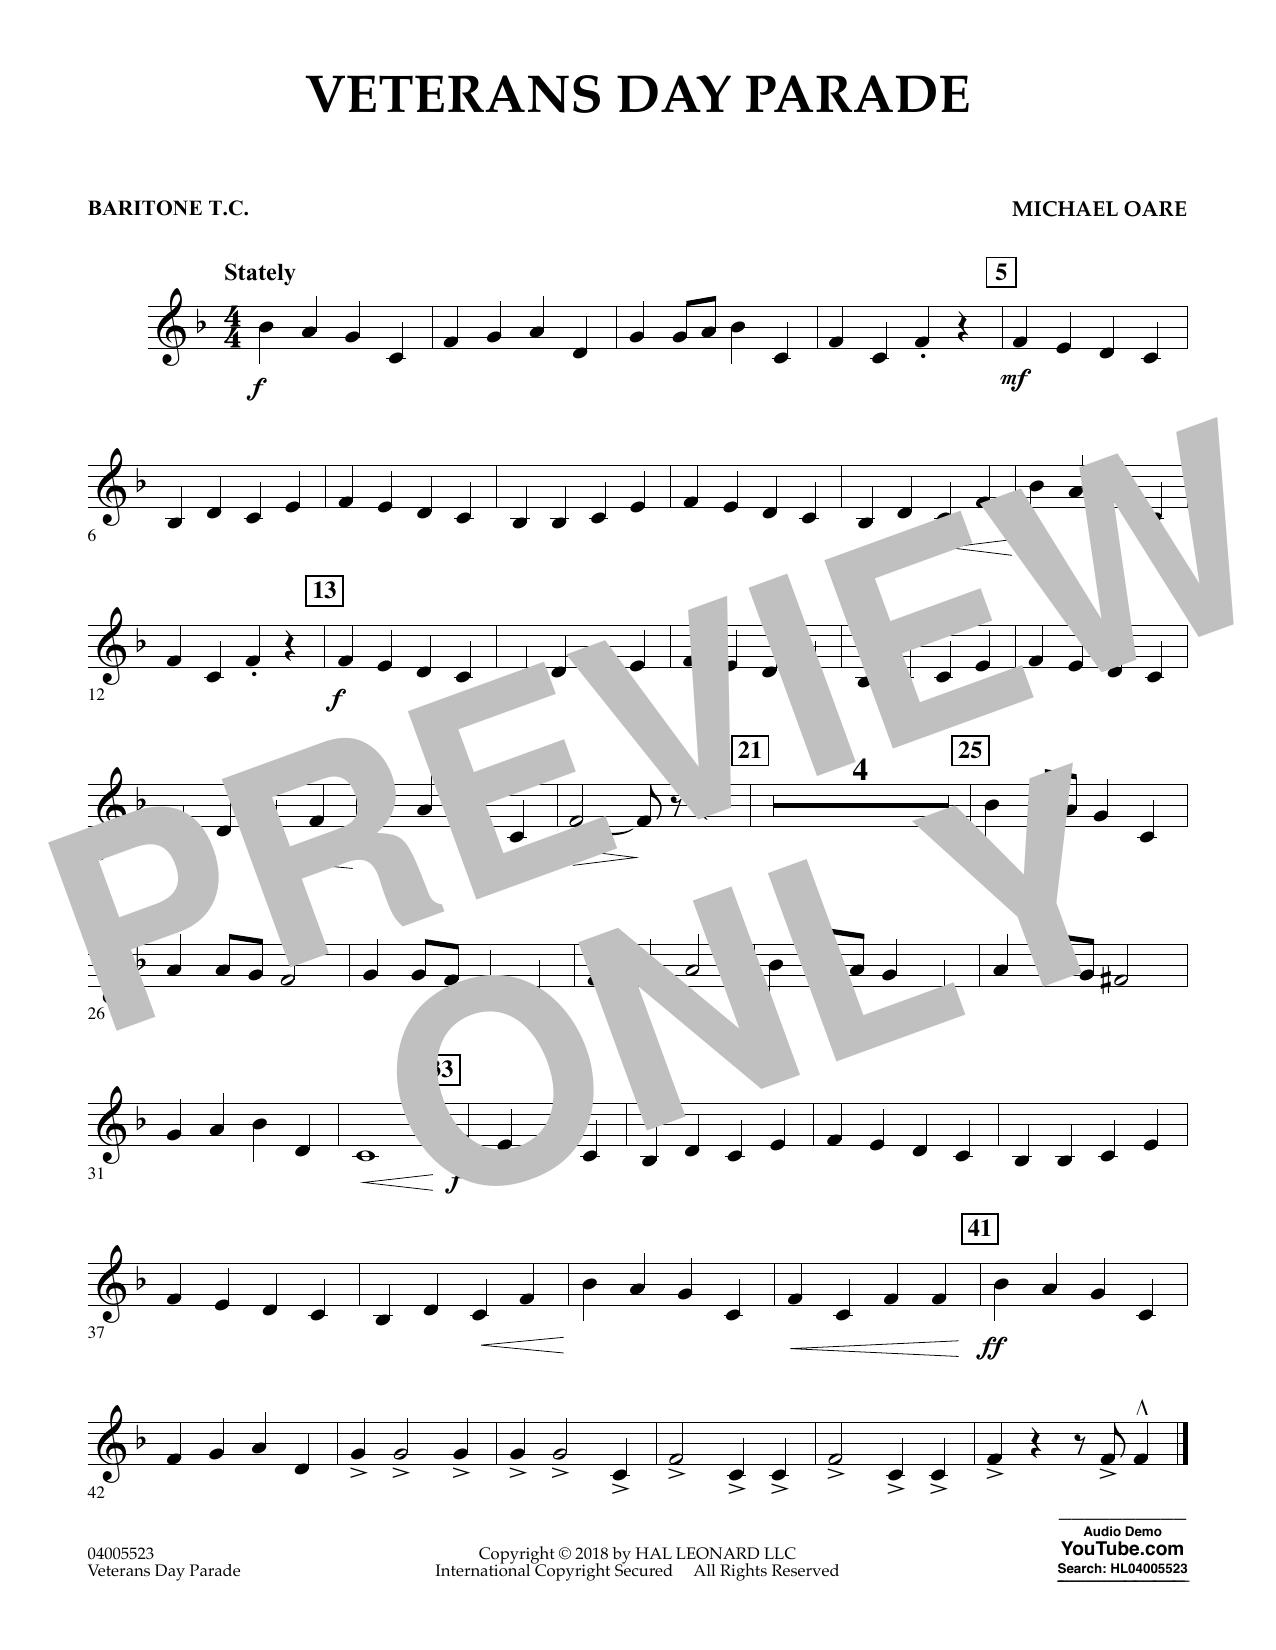 Veterans Day Parade - Baritone T.C. (Concert Band)